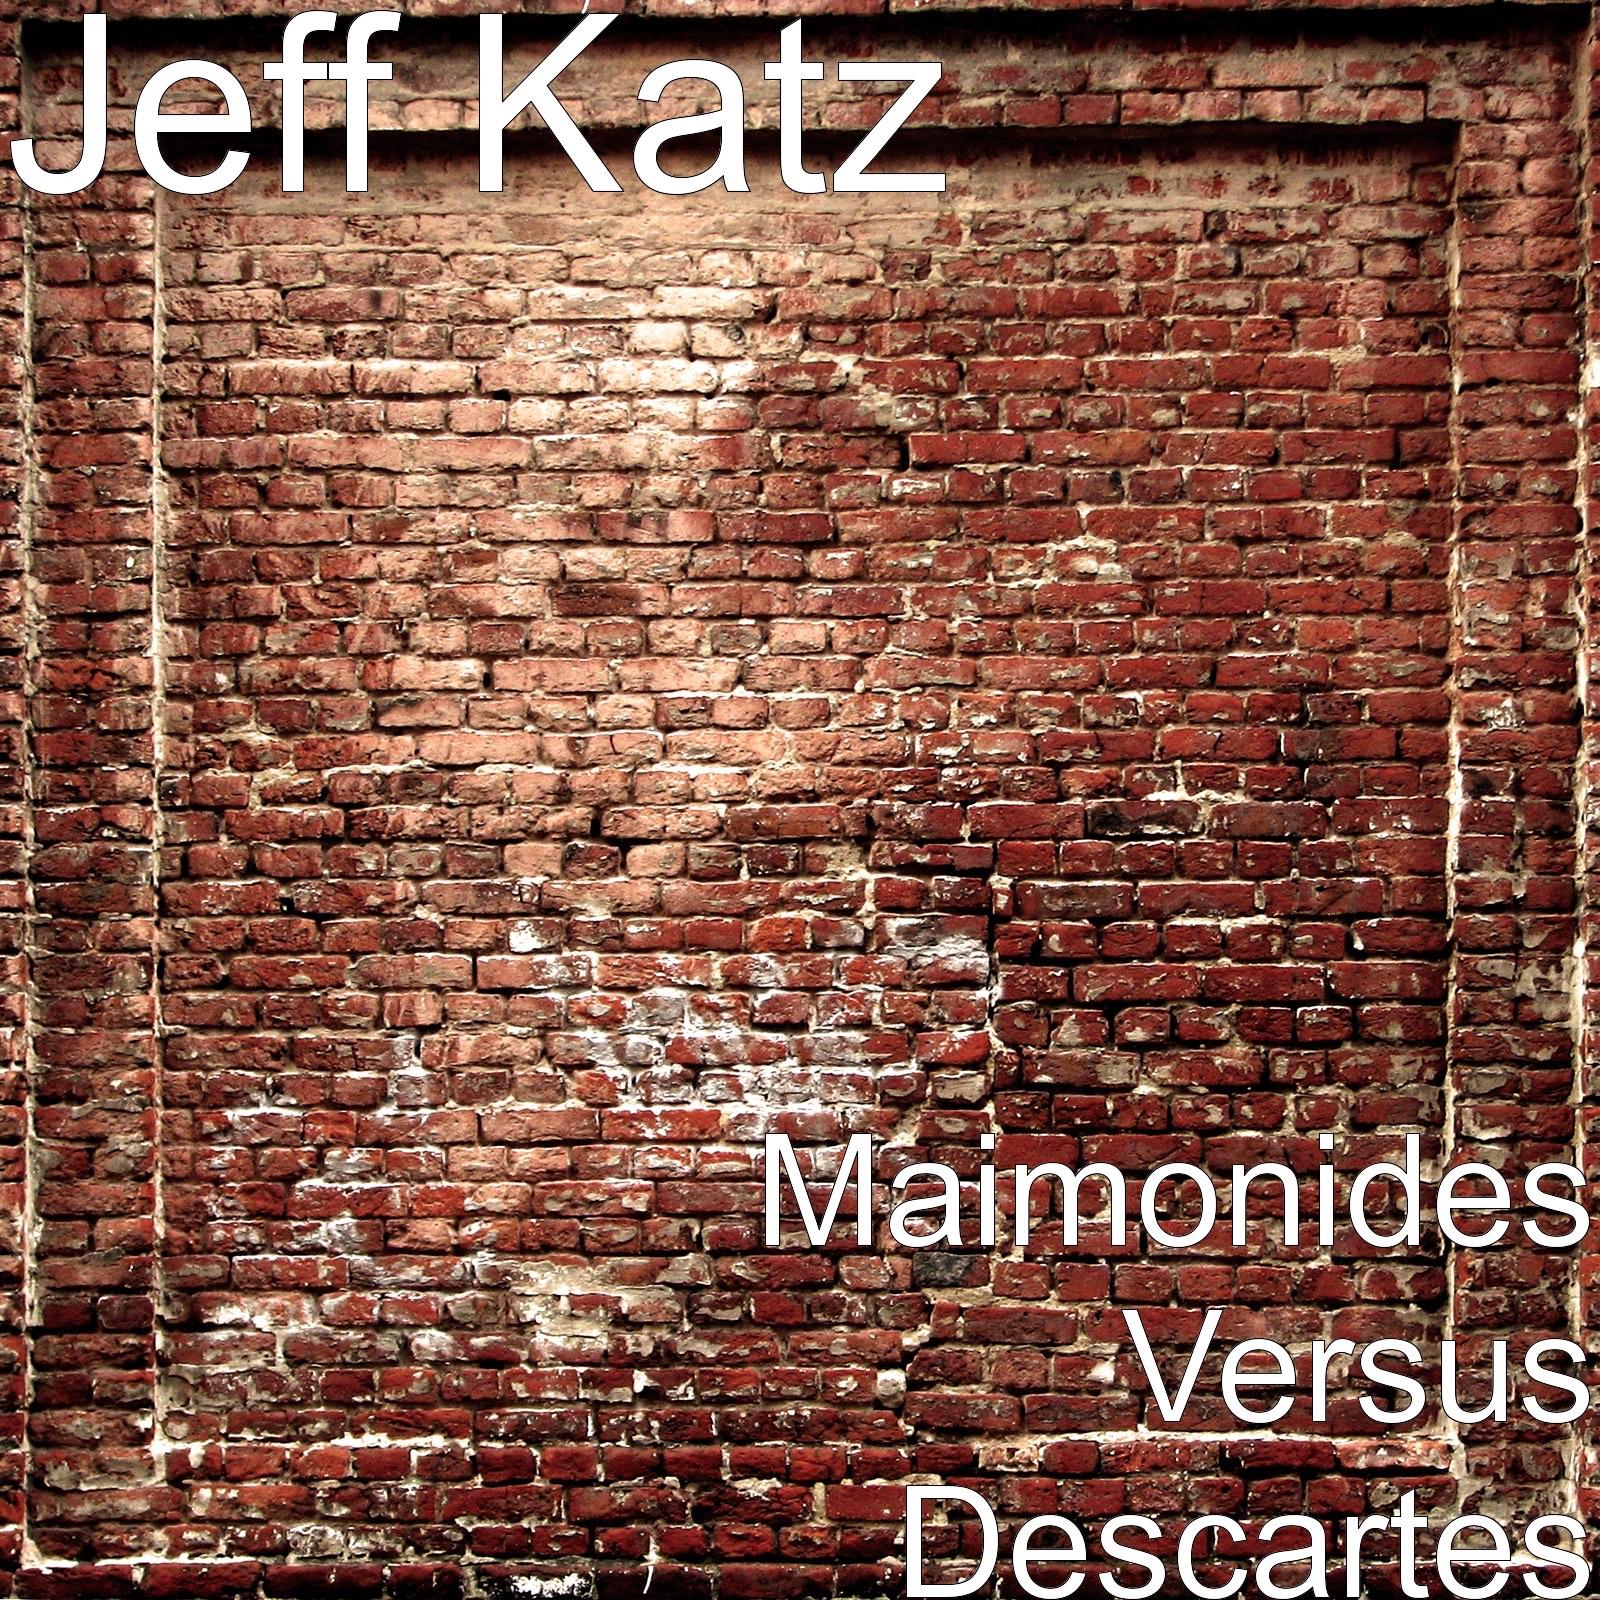 Maimonides Versus Descartes